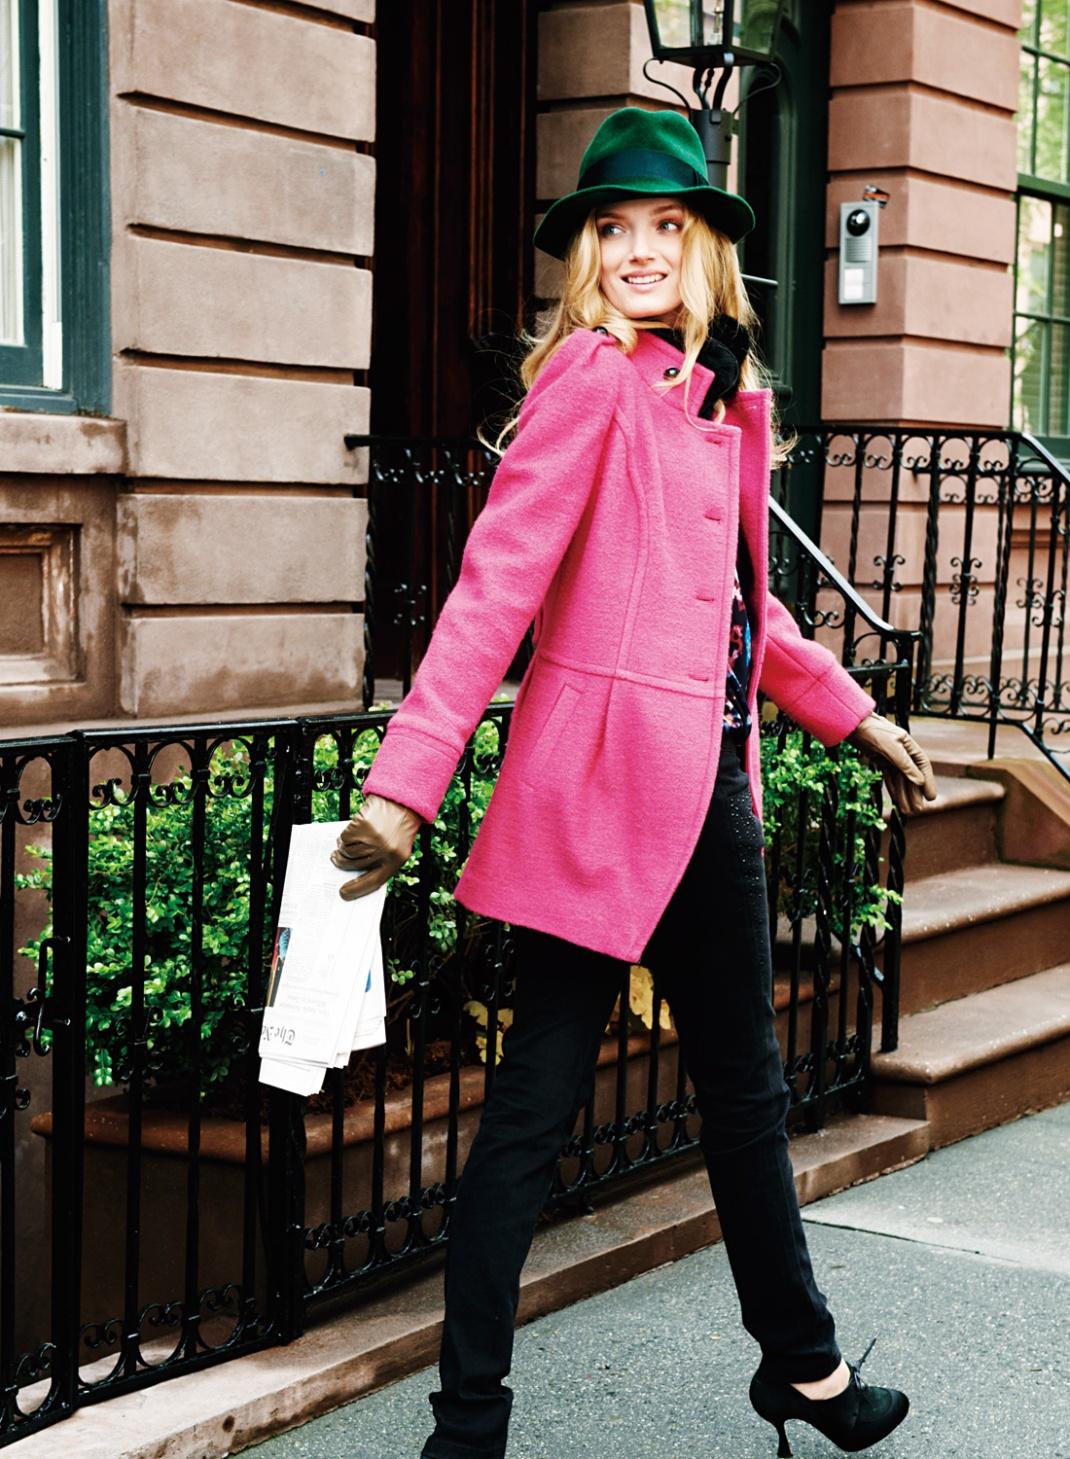 www.cognacandcoffee.tumblr.com